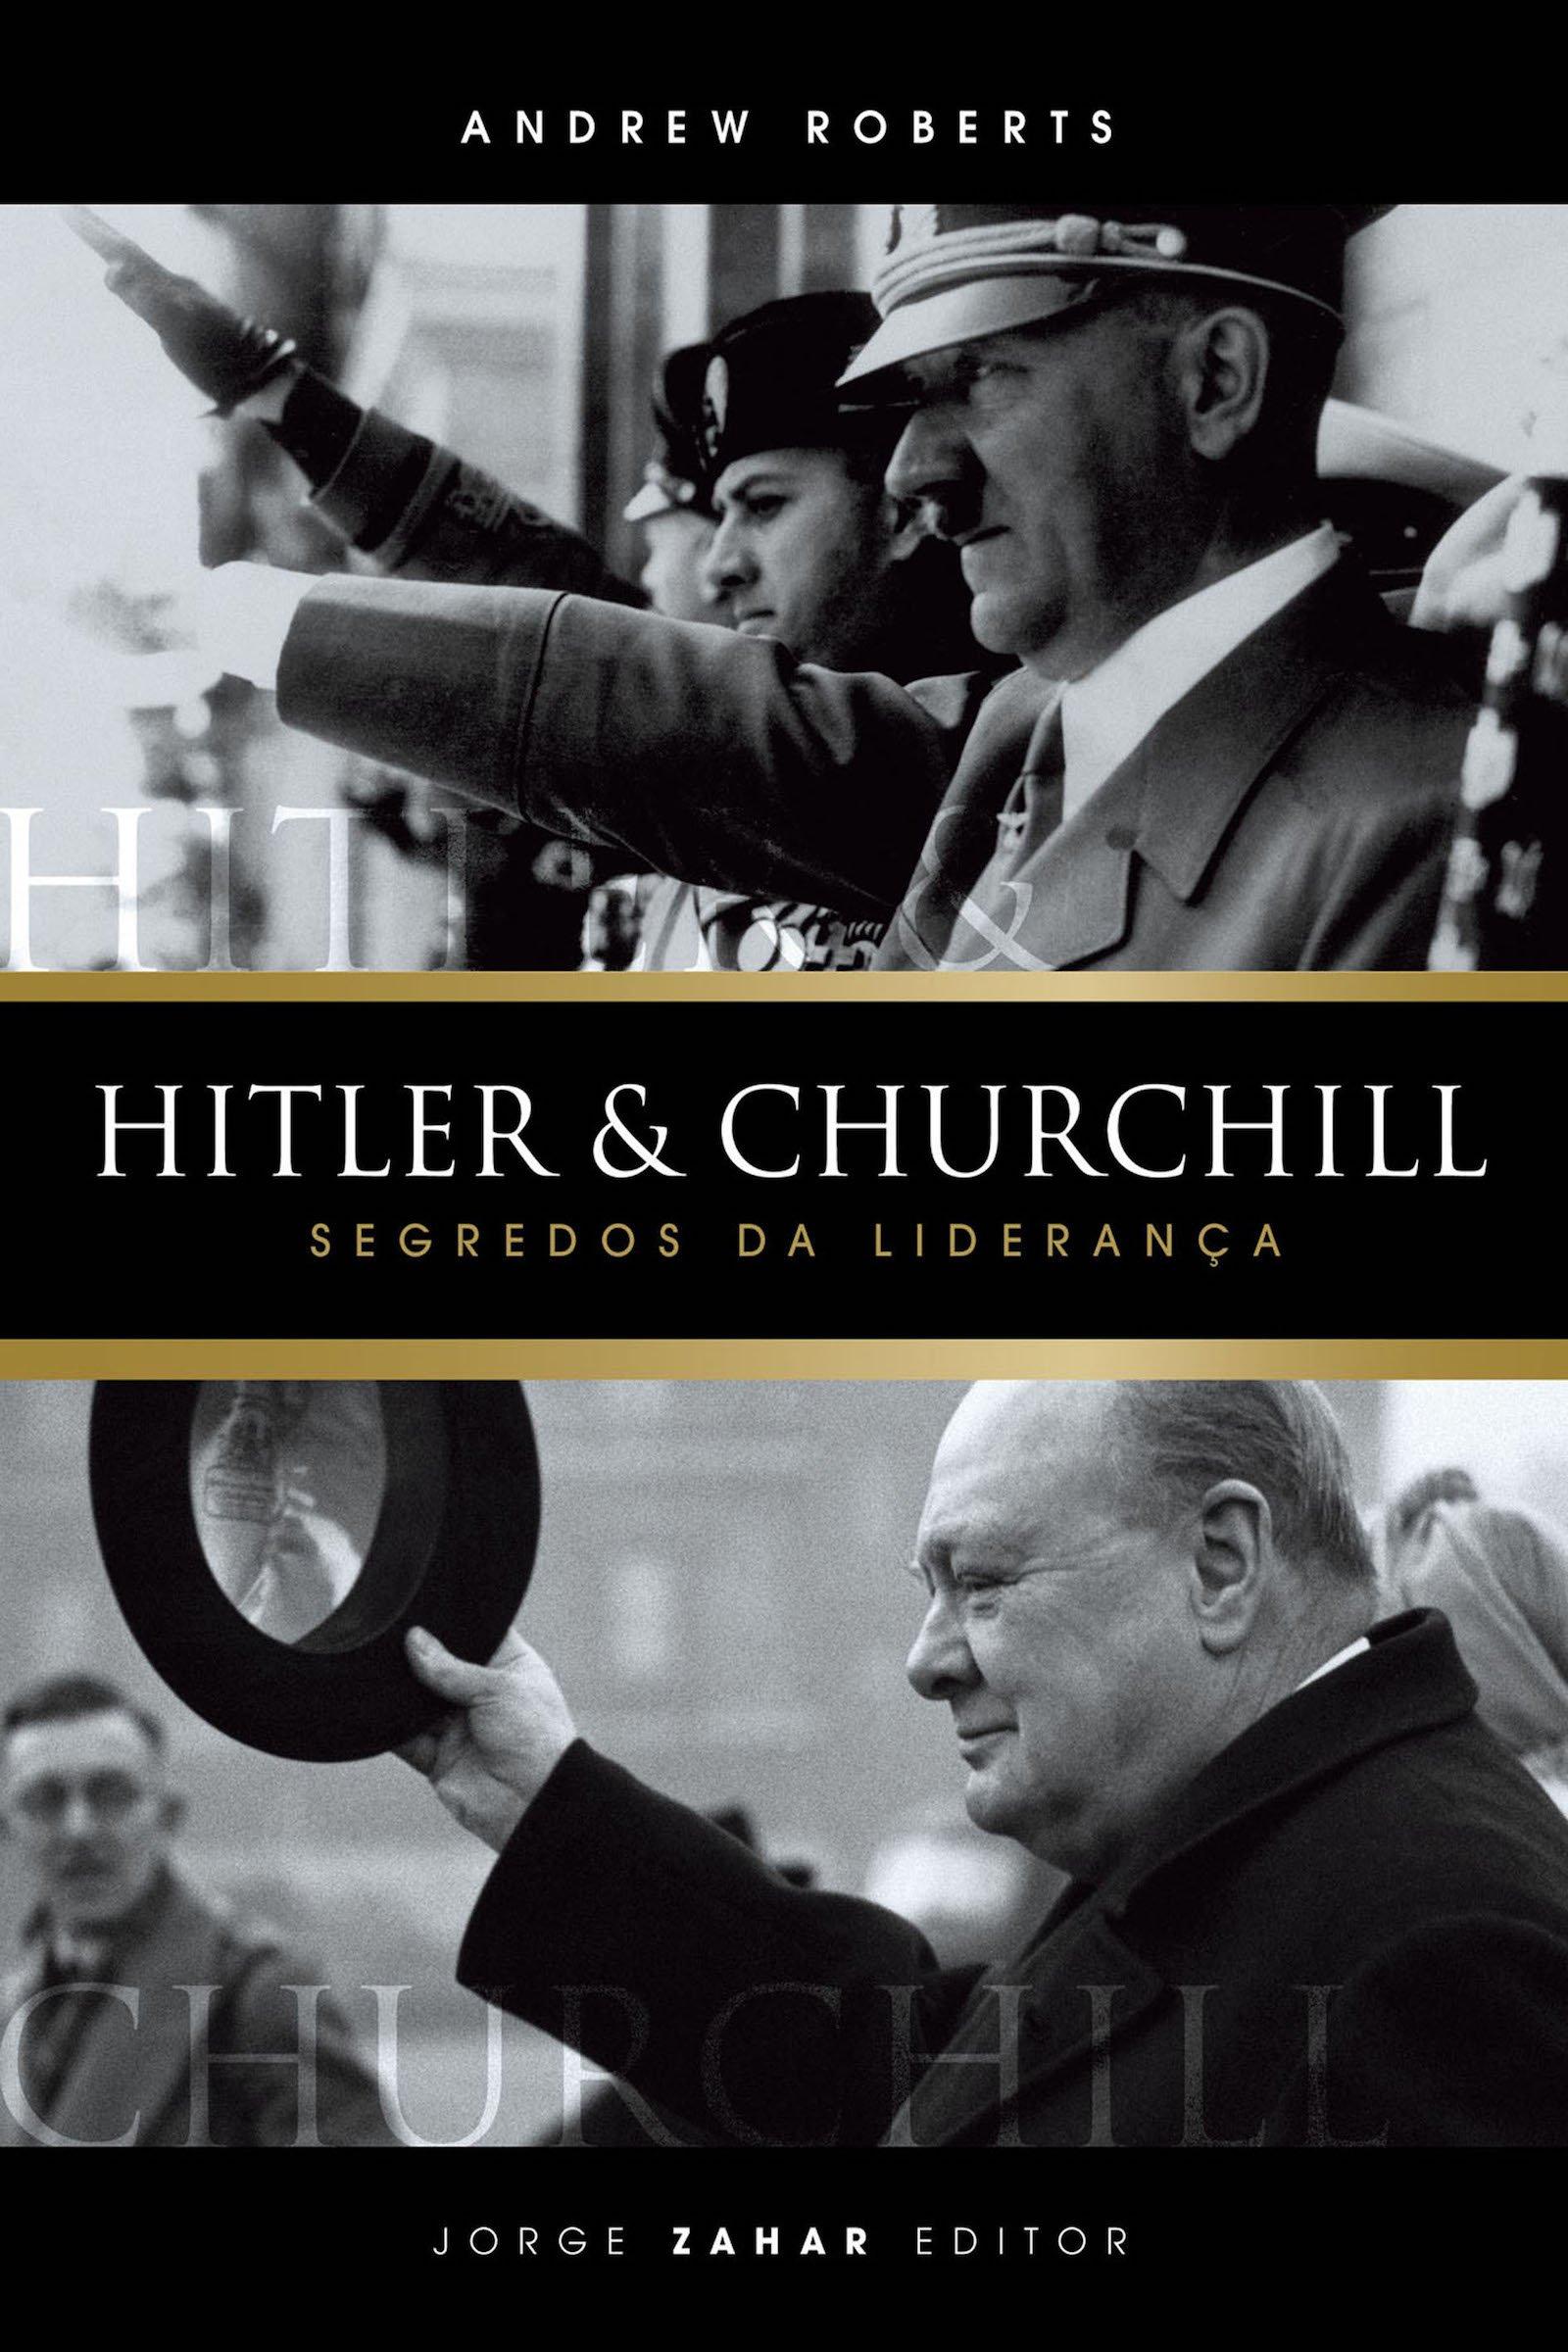 Hitler e Churchill: Segredos da Liderança